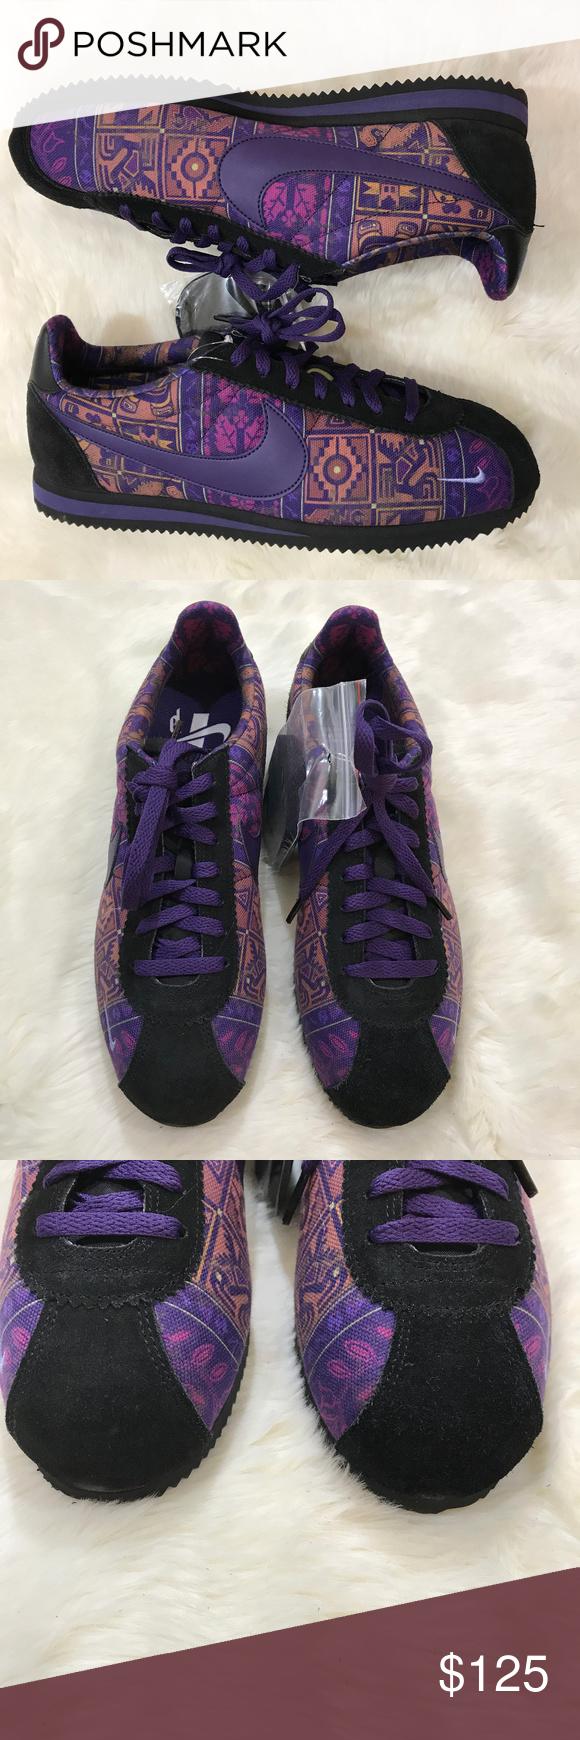 Nike Cortez Men LHM x Inti One Heart Los Primeros New